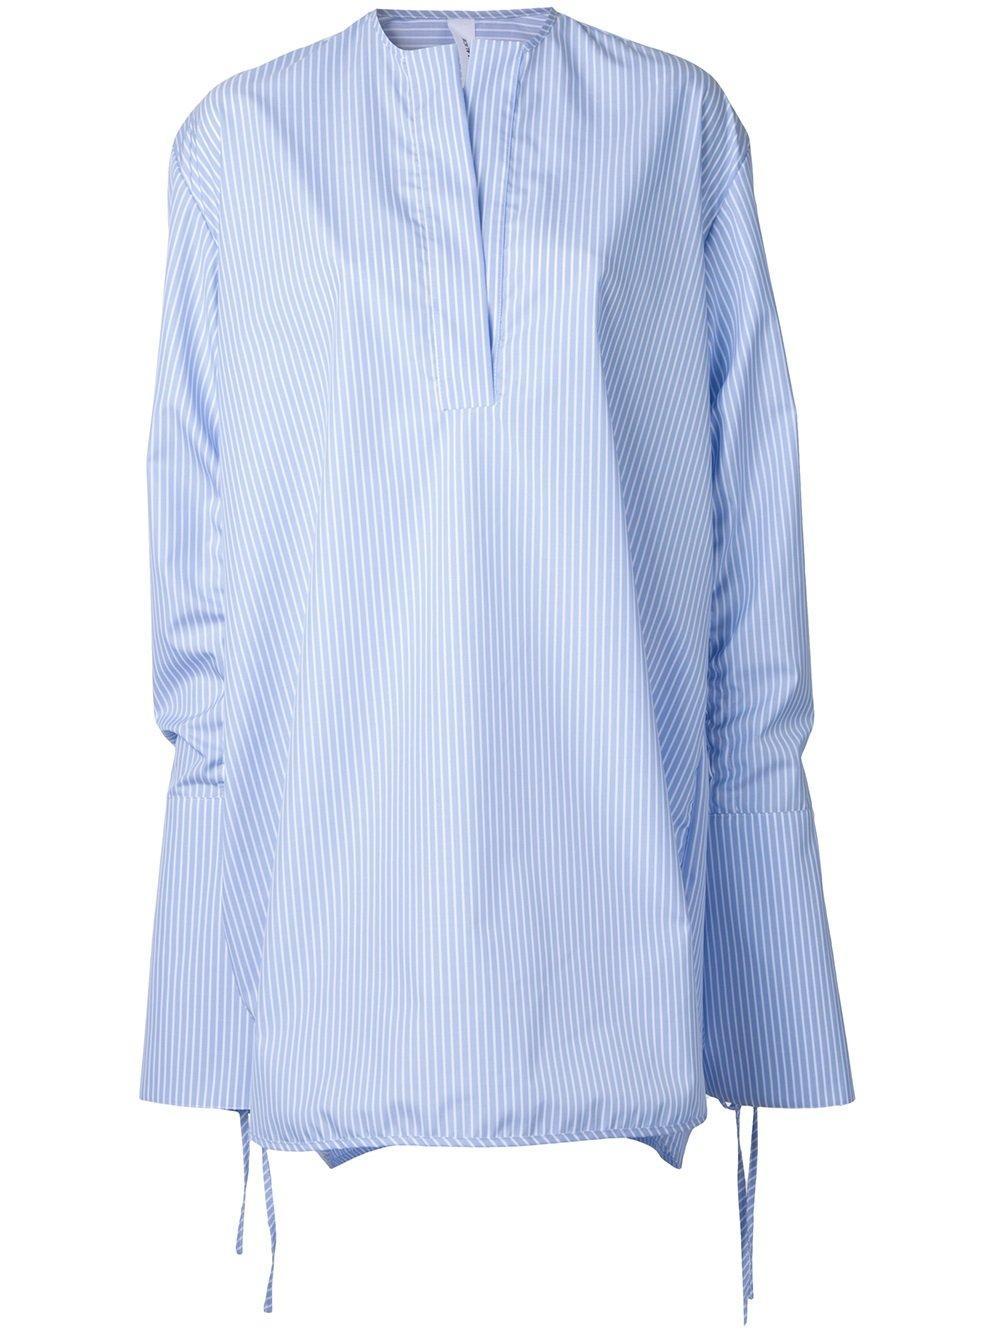 georgia alice perret oversized shirt in blue lyst. Black Bedroom Furniture Sets. Home Design Ideas